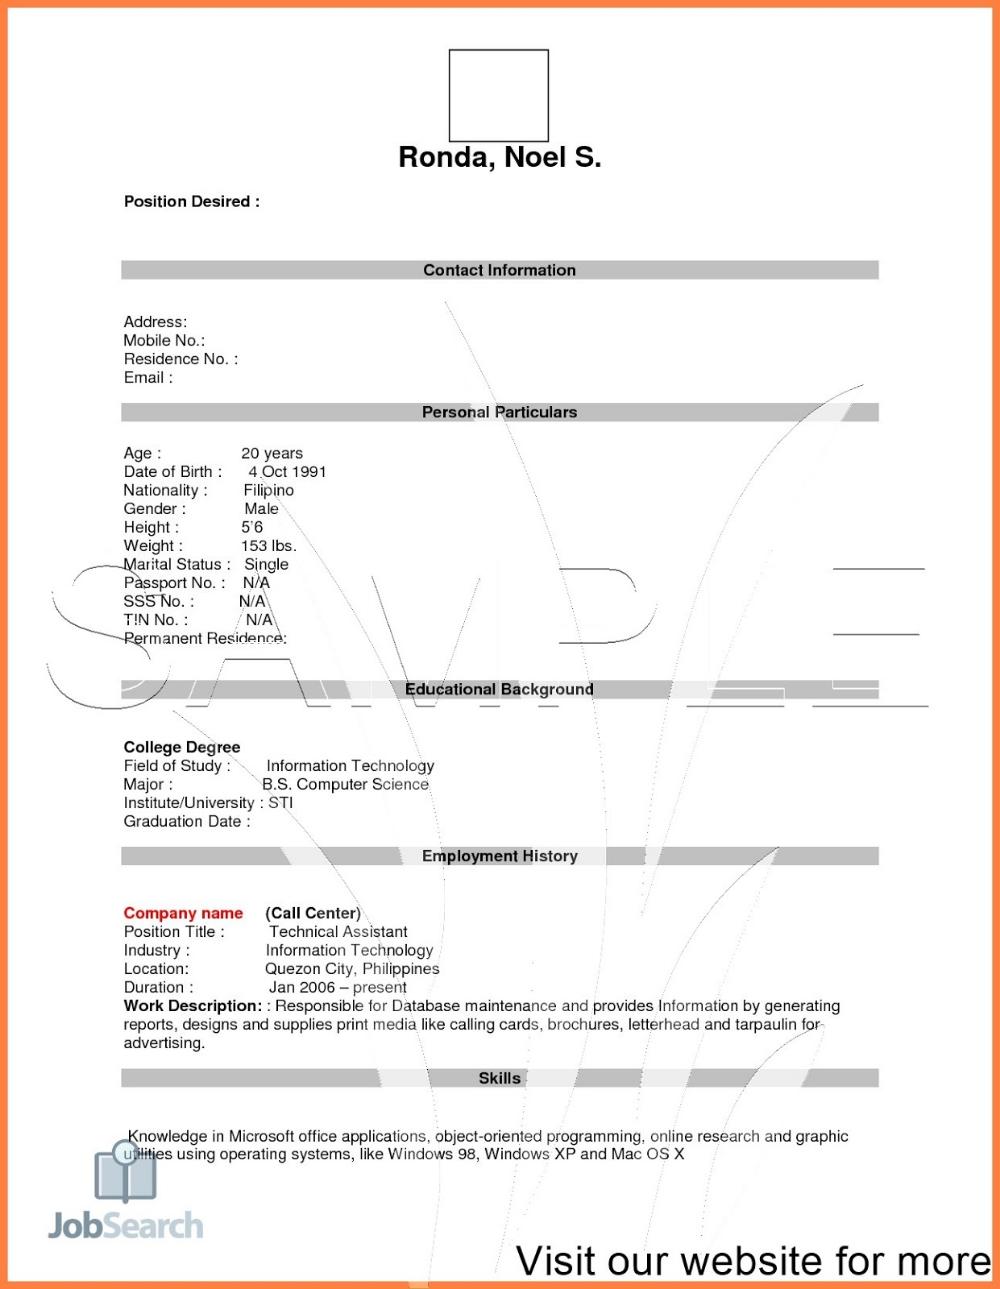 Job Resume Pdf 2020 Job Resume For Freshers In 2020 Resume Pdf Job Resume Job Resume Examples